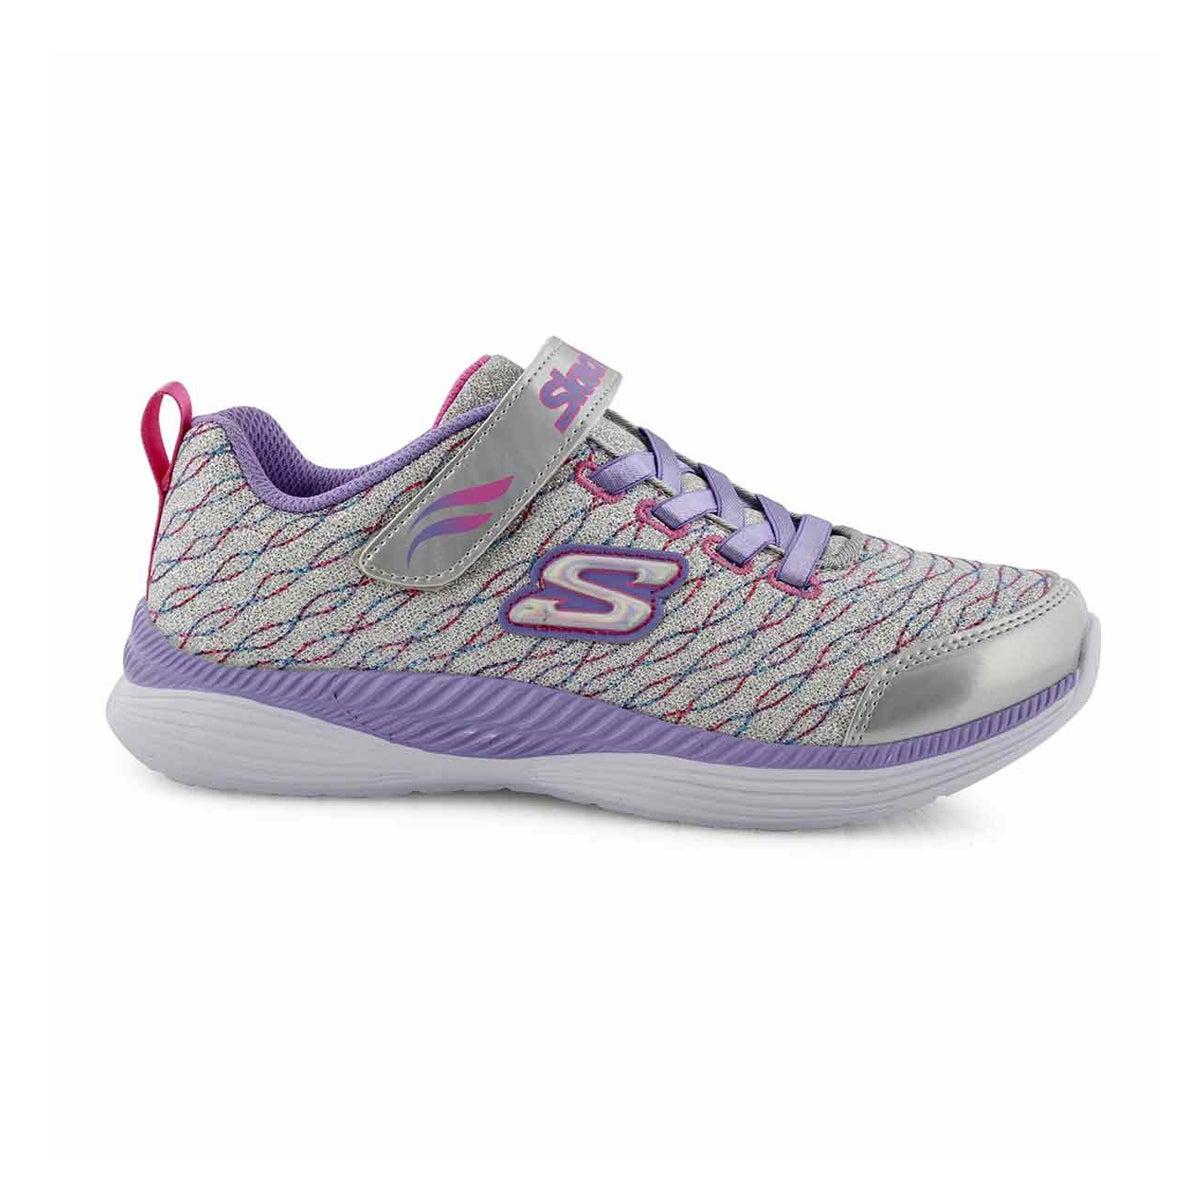 Grls Move 'N Groove slvr/lvndr sneaker